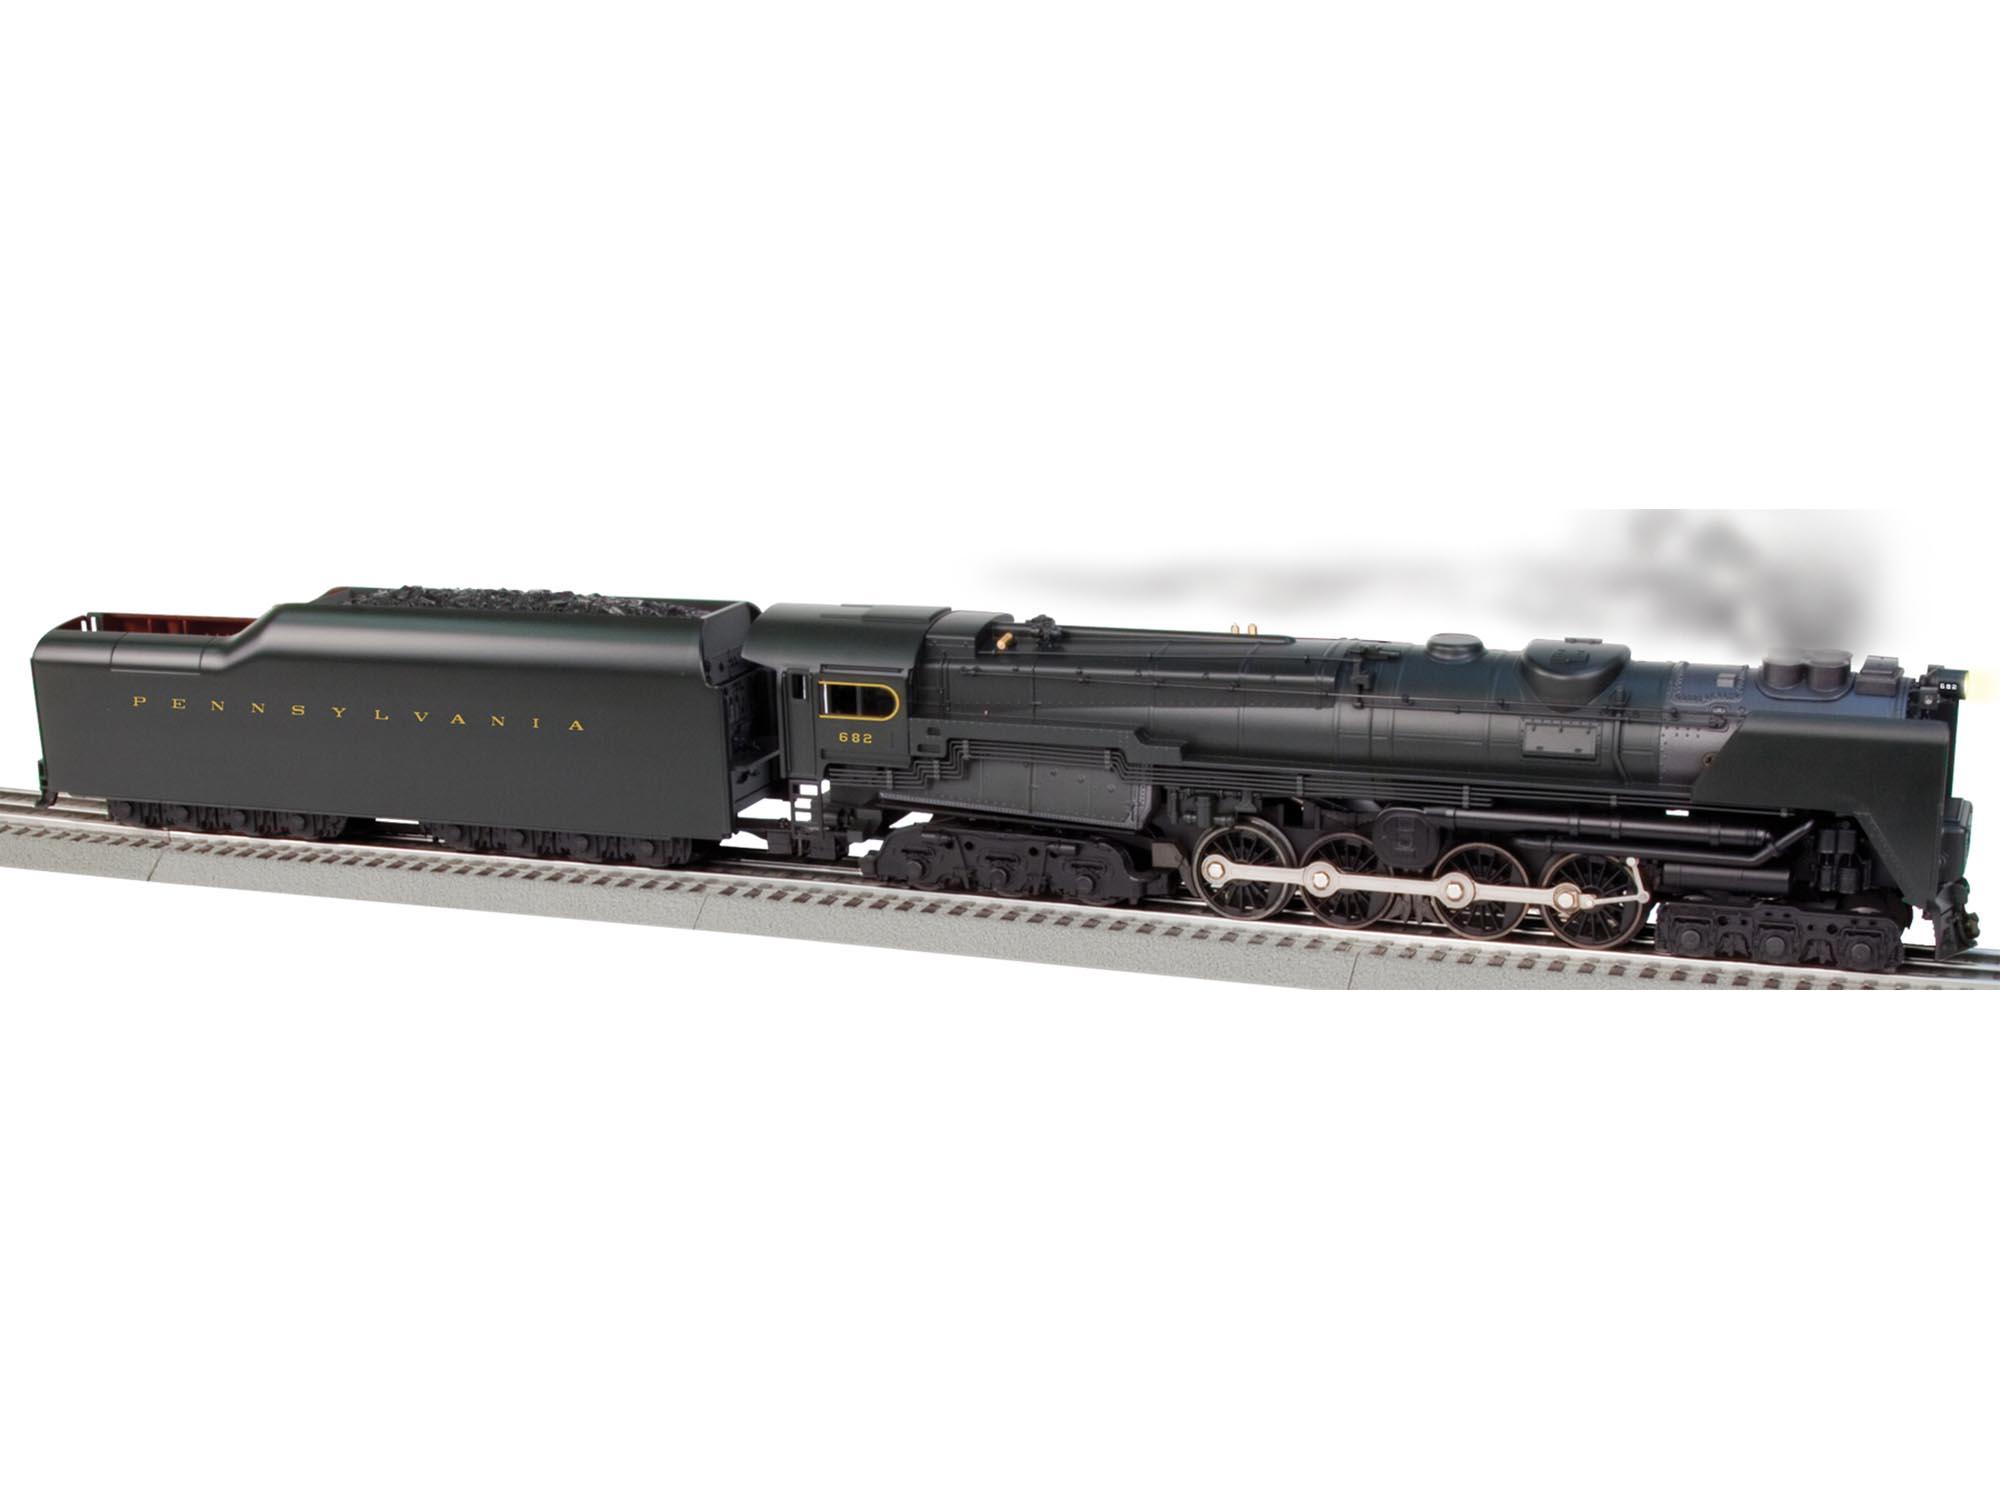 Pennsylvania LEGACY S 2 Turbine Steam Lo otive 682